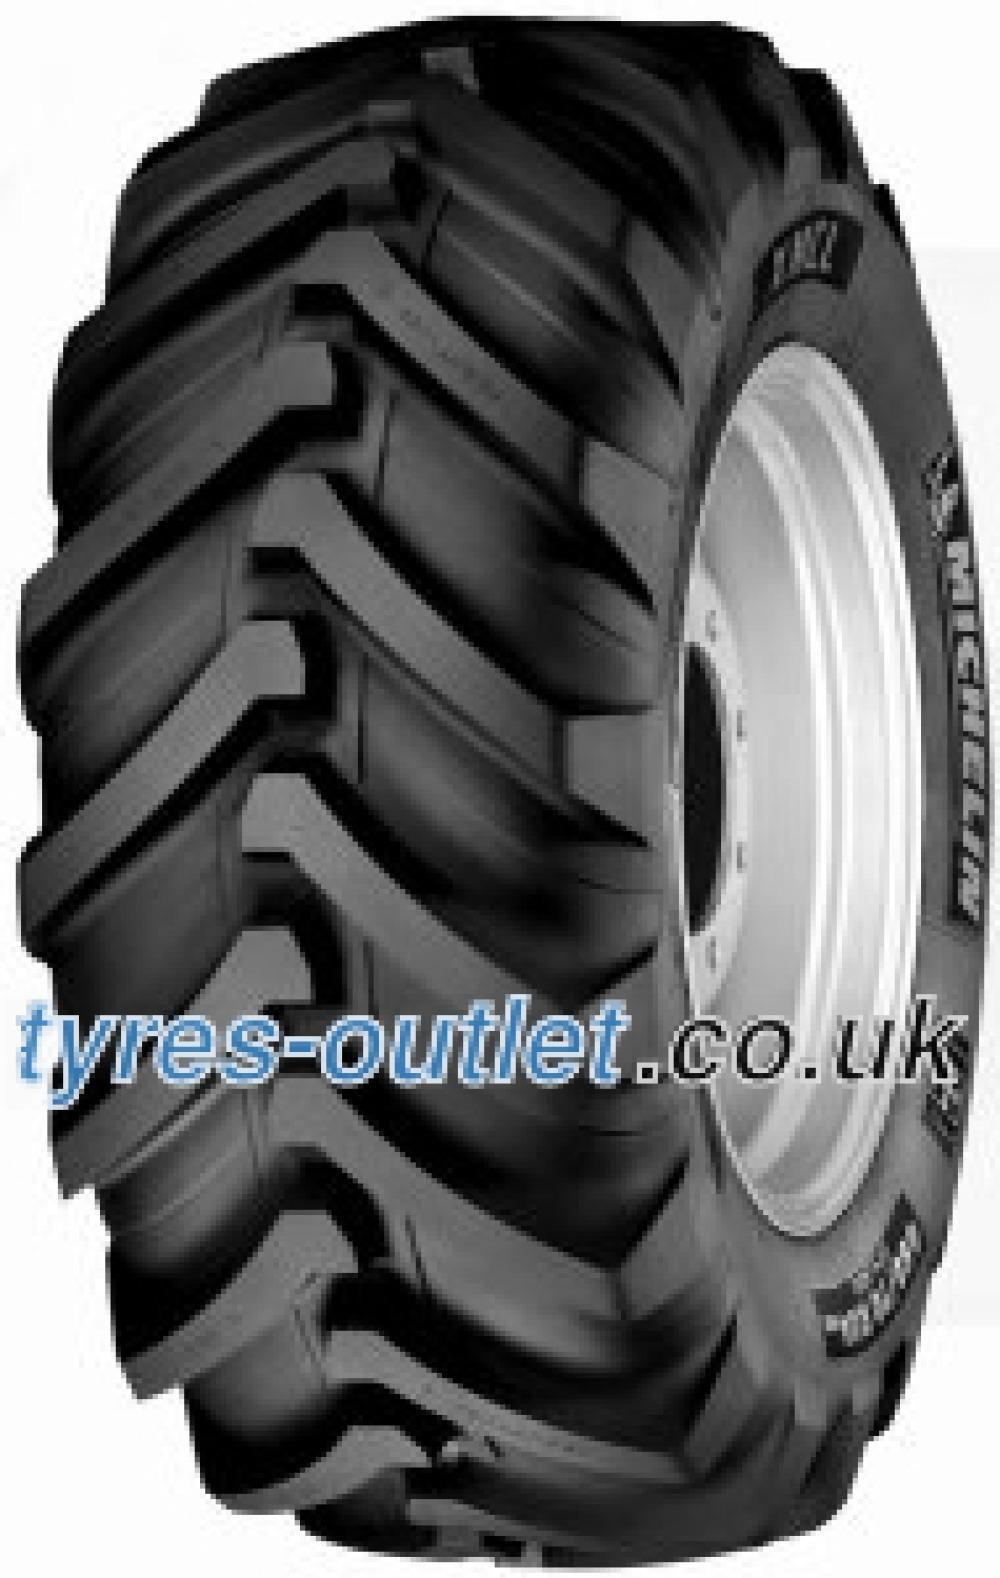 Michelin XMCL ( 340/80 R18 143A8 TL Dual Branding 12.5/80 R18 143B )